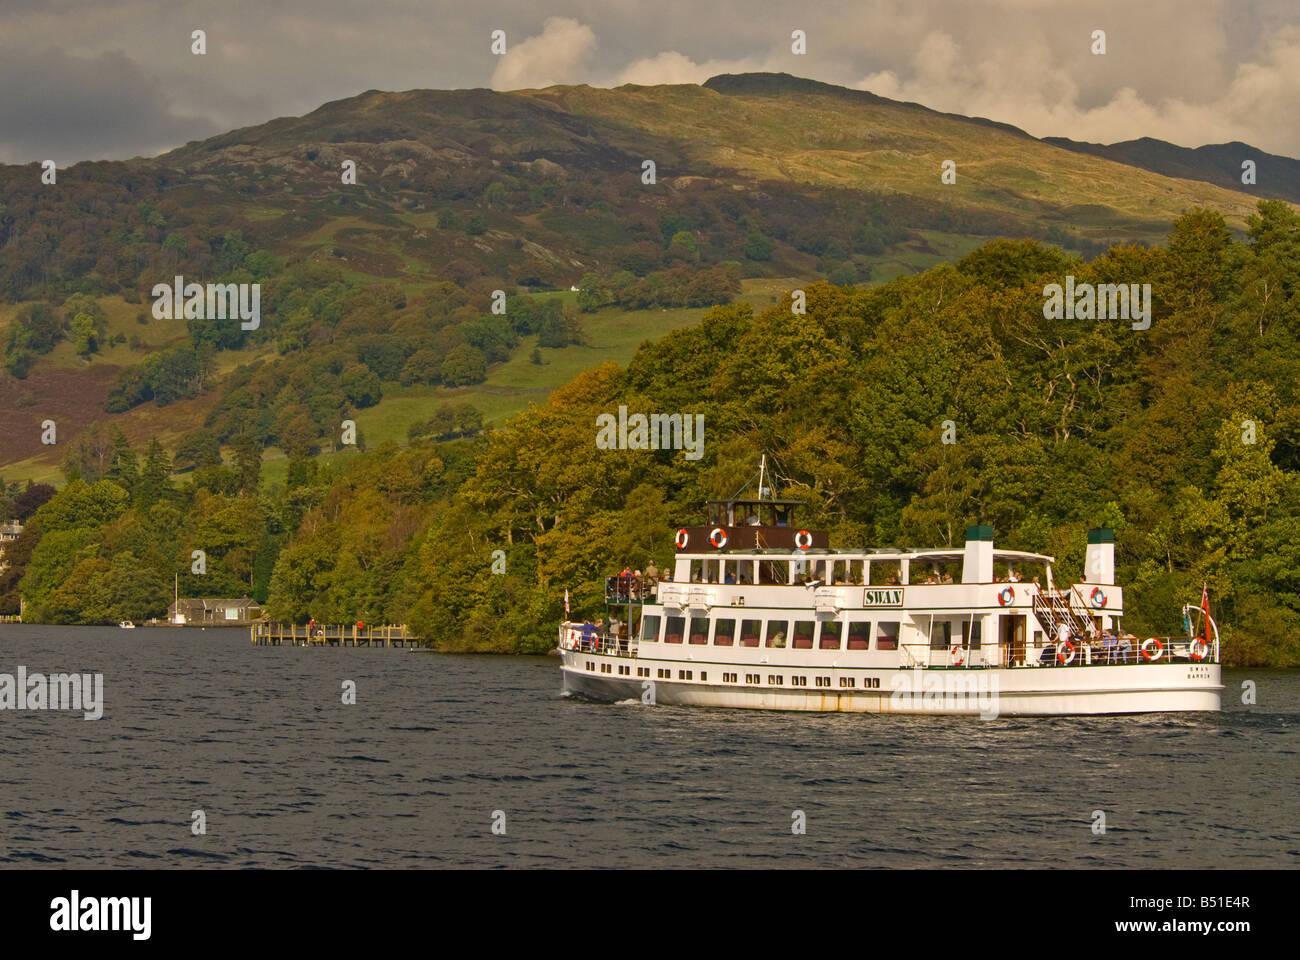 steamer Tour boat tourists Lake Windermere Lake District Cumbria UK United Kingdom fall autumn color change leaves - Stock Image